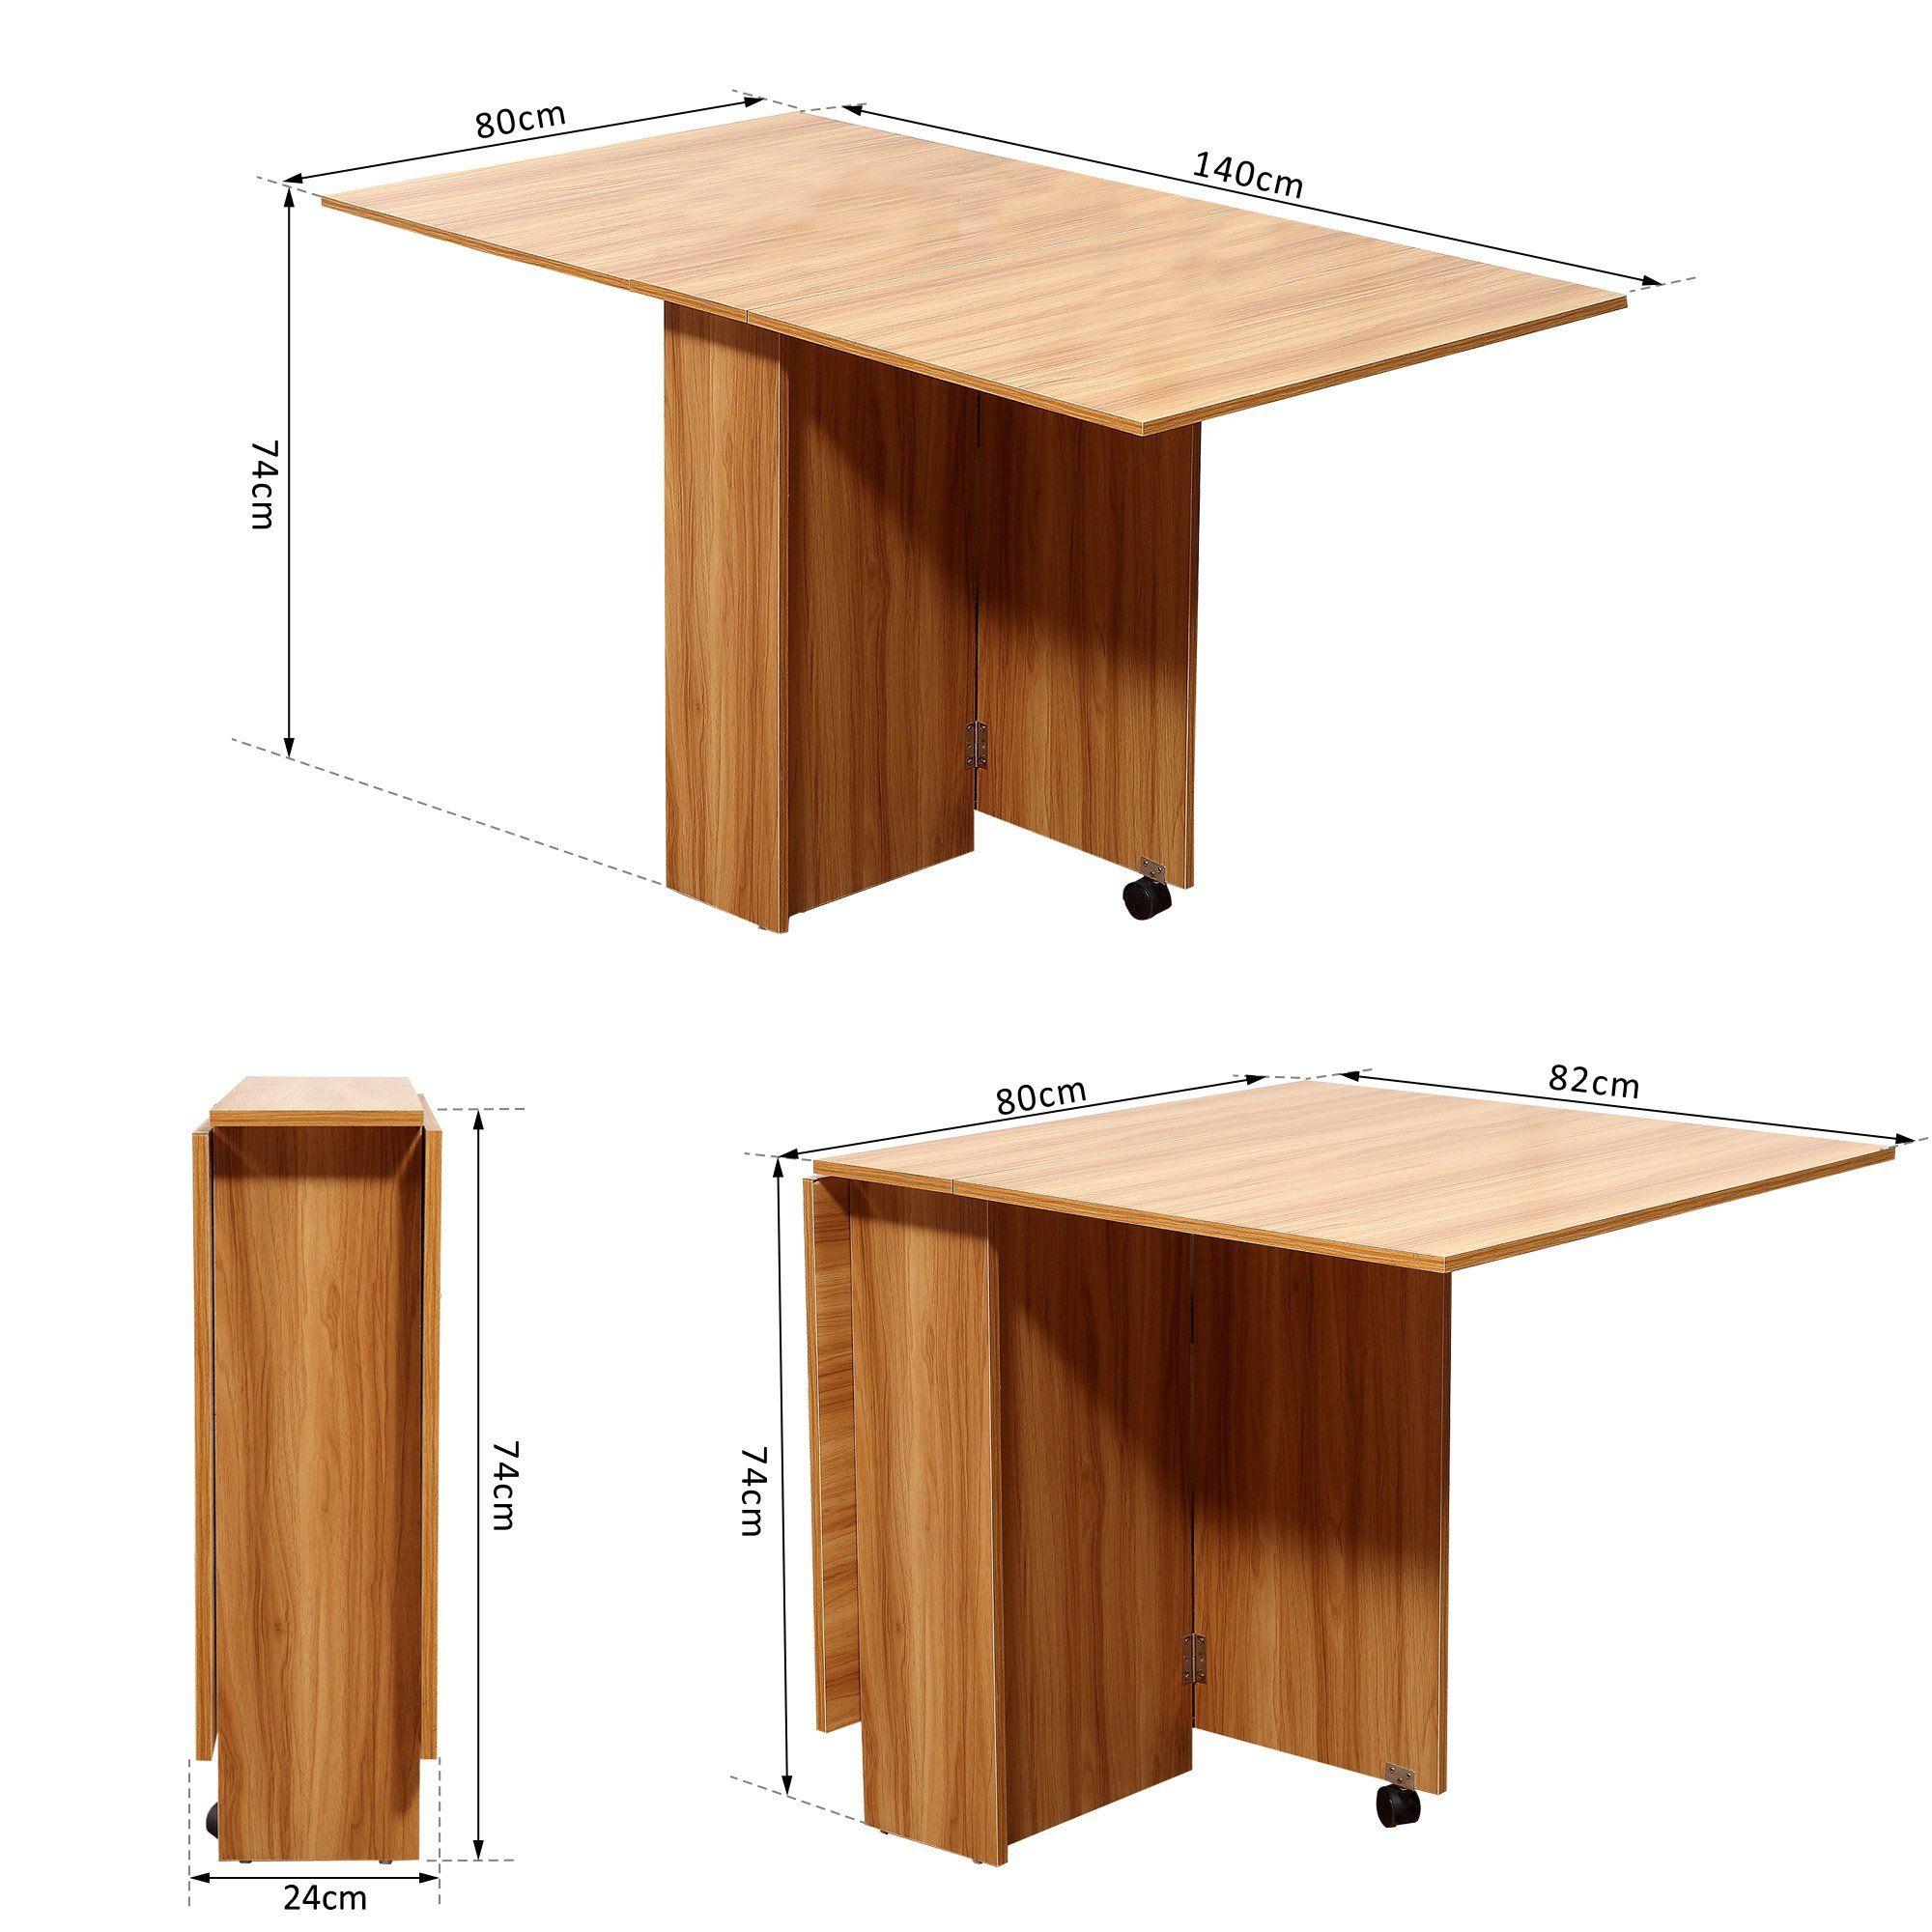 Tavolo Da Pranzo Pieghevole.Table De Cuisine Salon Table Pliable Table Mobile Sur Roulettes Dim 140l X 80l X 74h Cm 2 Etageres Integrees Coloris C In 2020 Home Decor Dining Table Decor